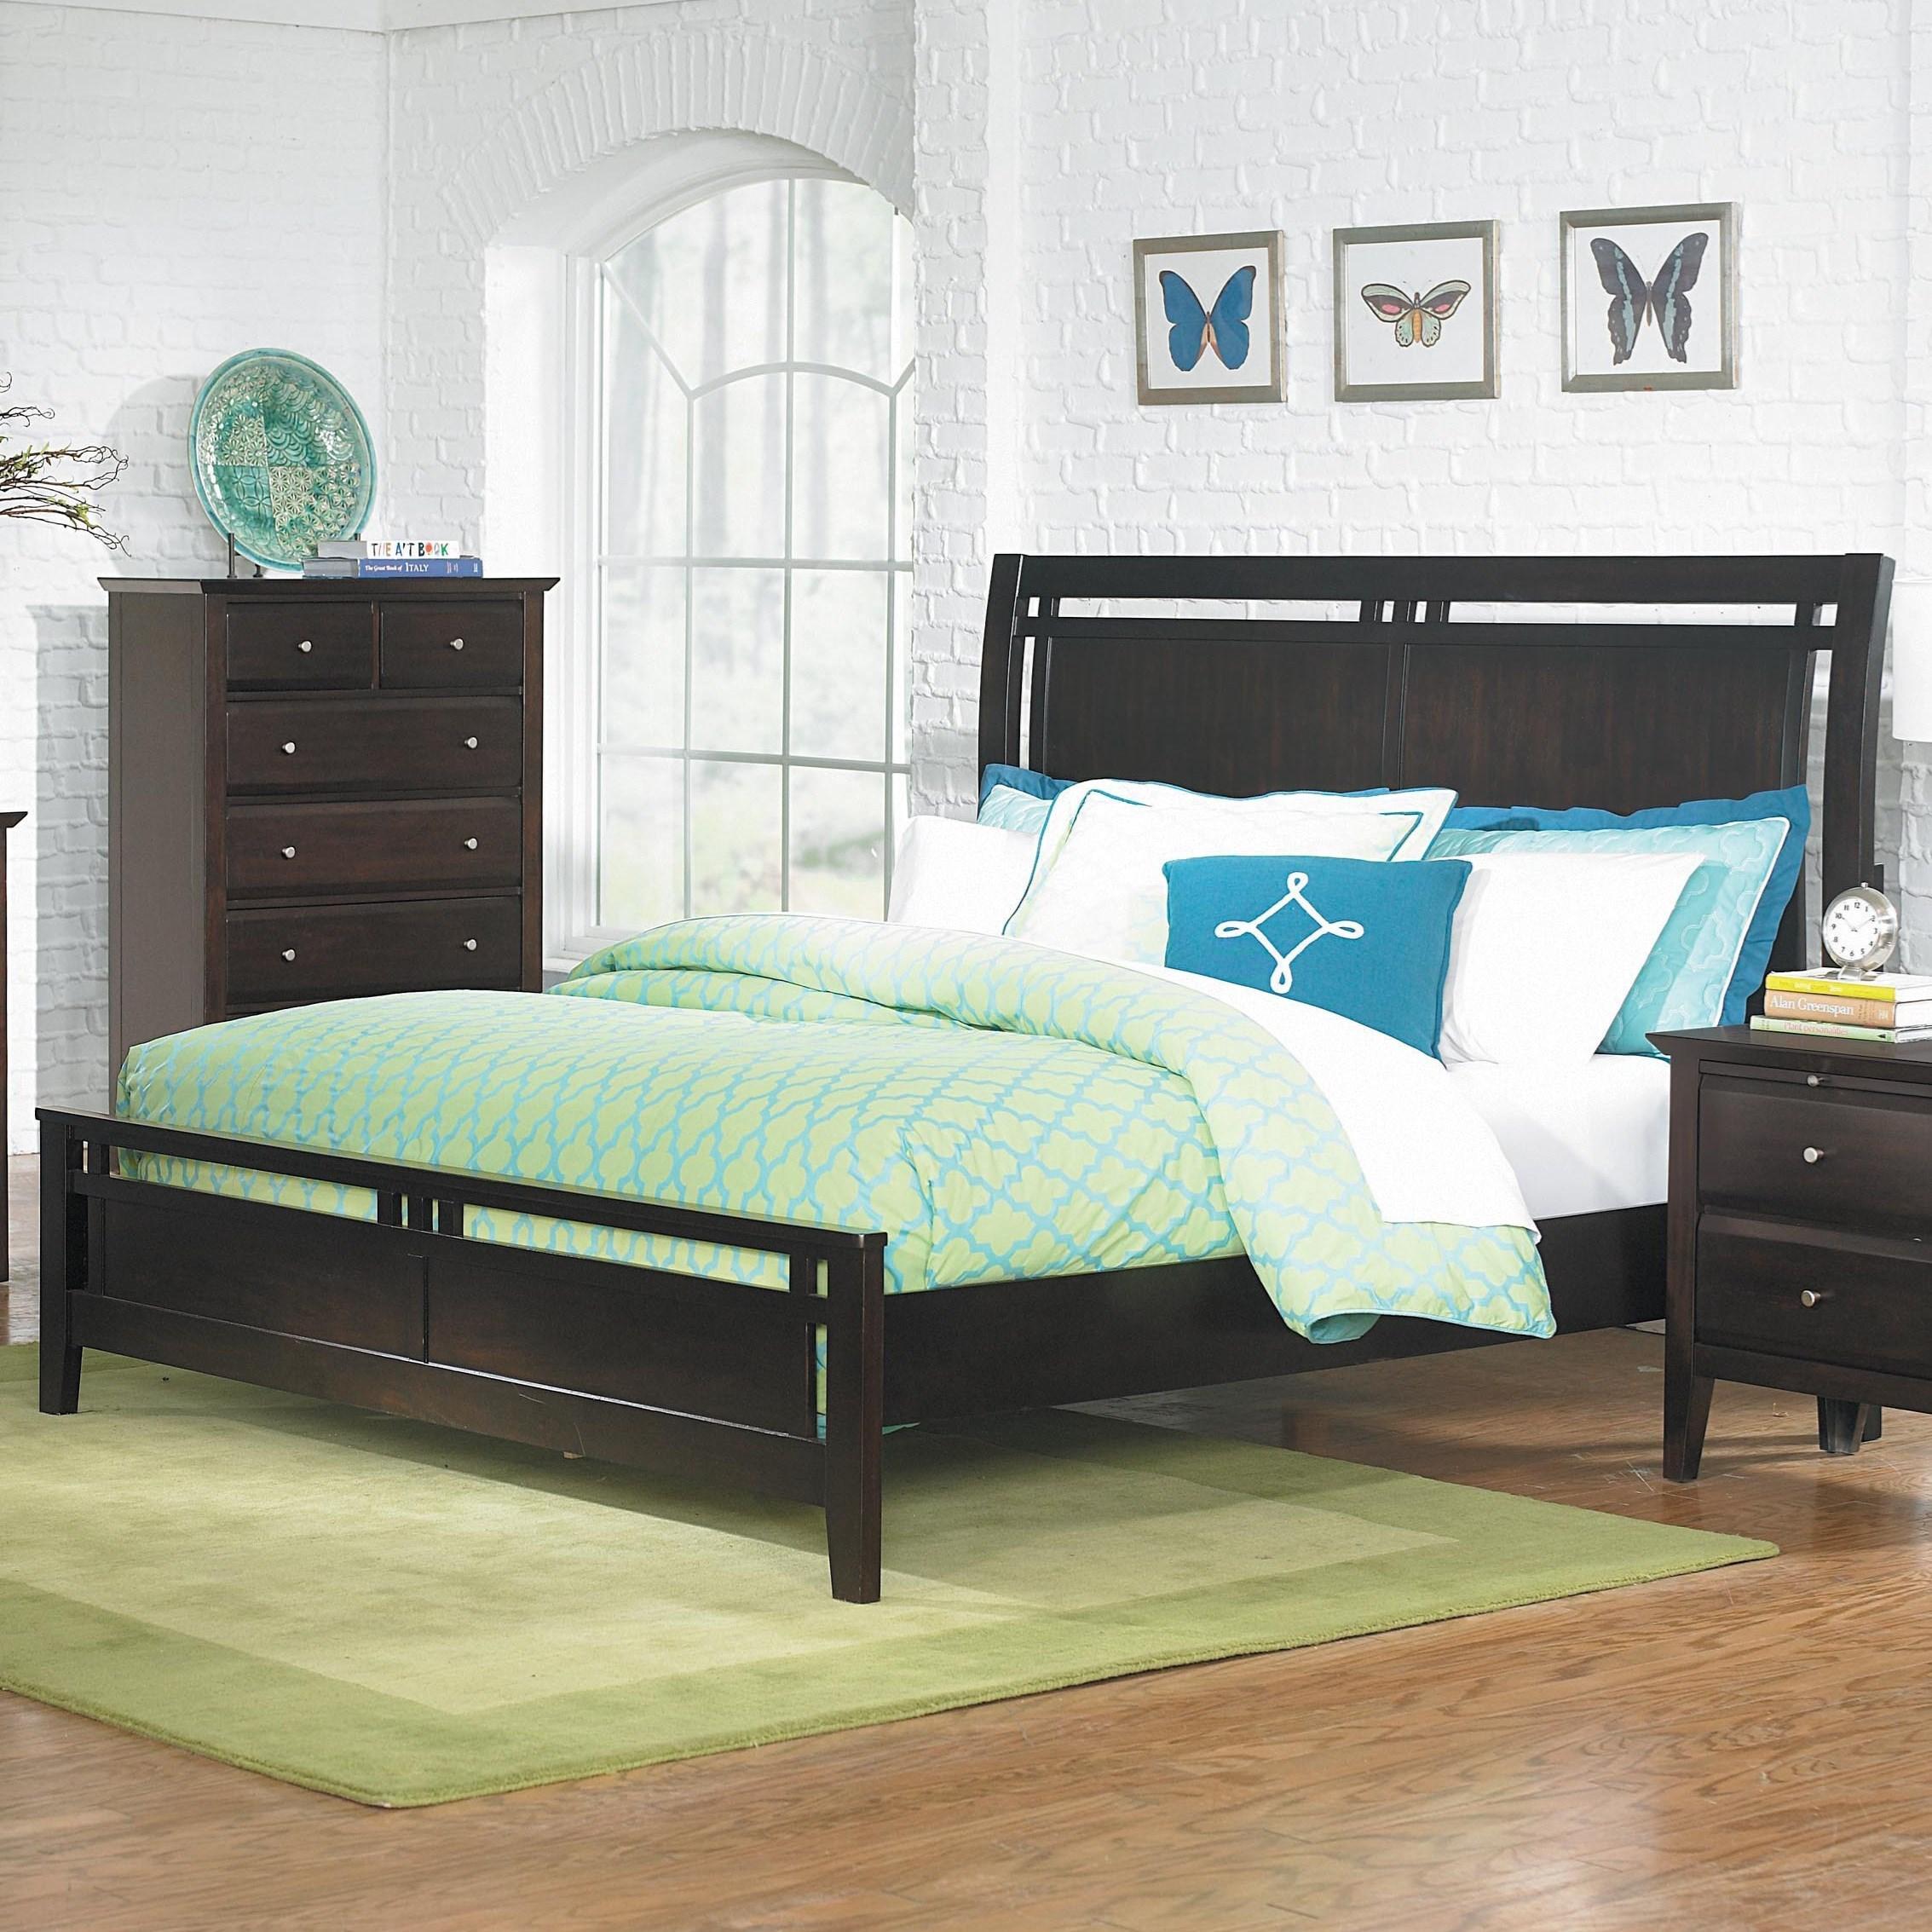 homelegance verano casual queen low profile bed del sol. Black Bedroom Furniture Sets. Home Design Ideas